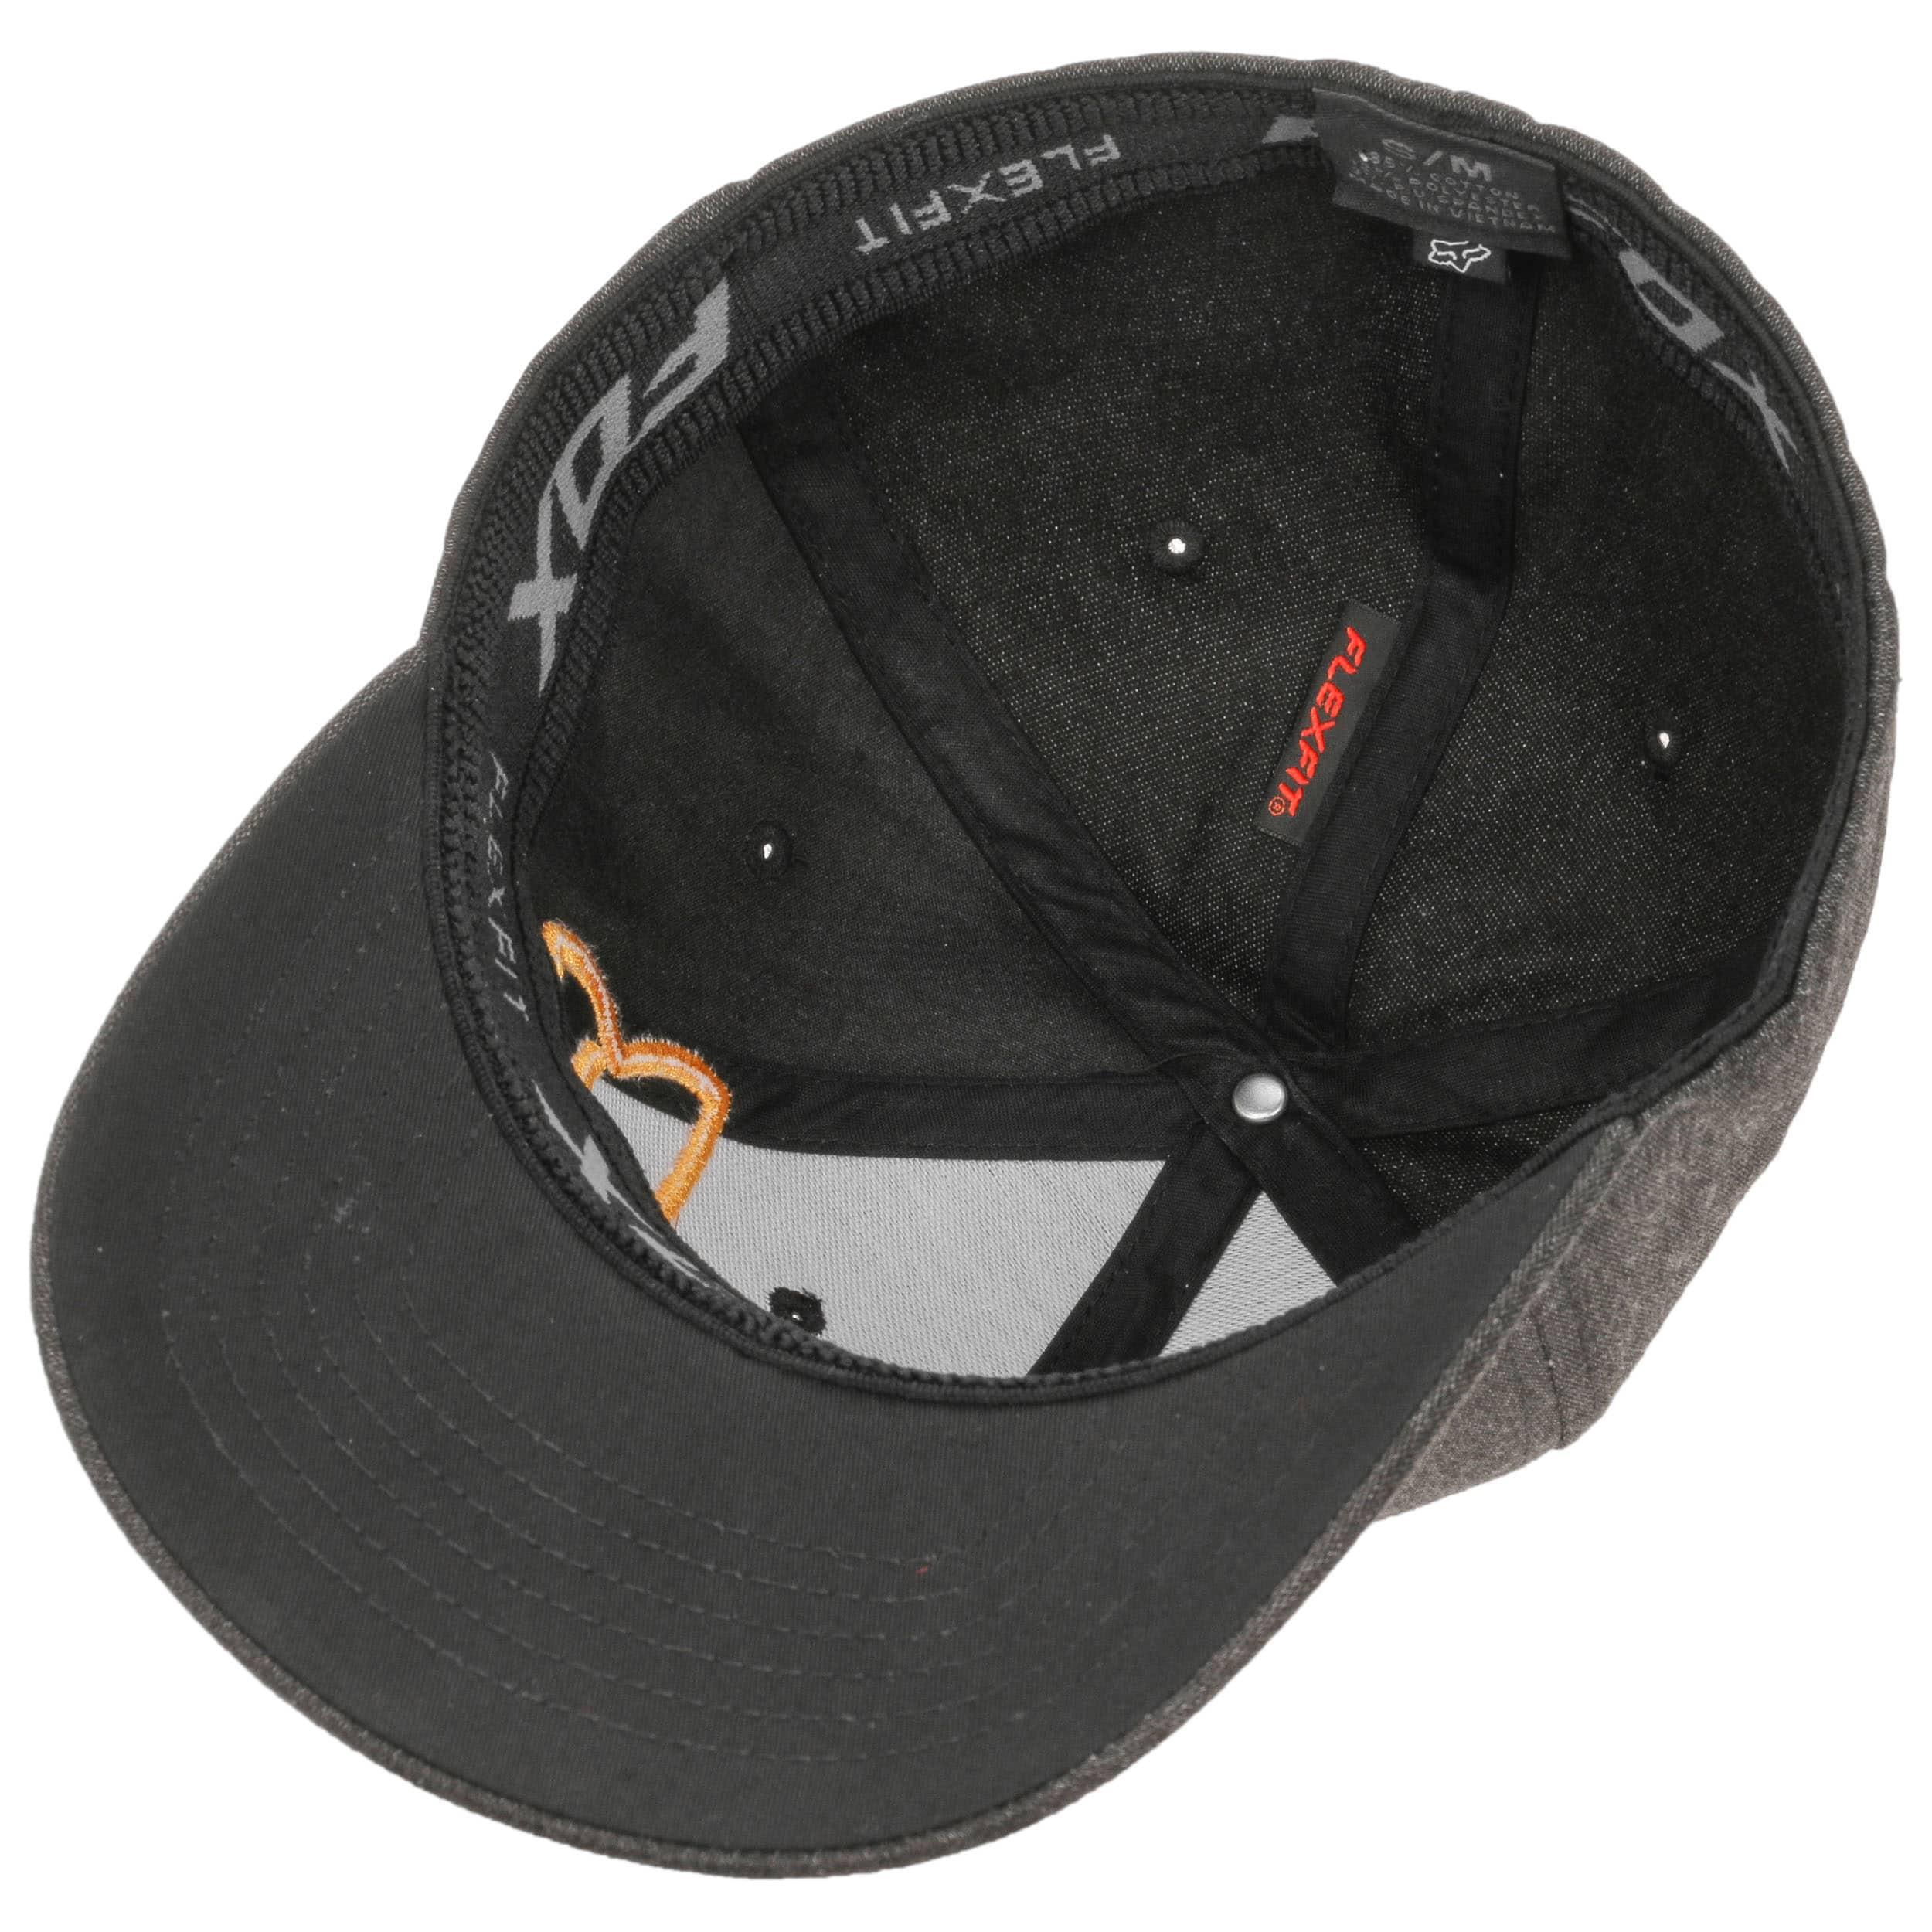 9fc4347320cdc ... free shipping clouded flexfit cap by fox black 2 12a90 956b4